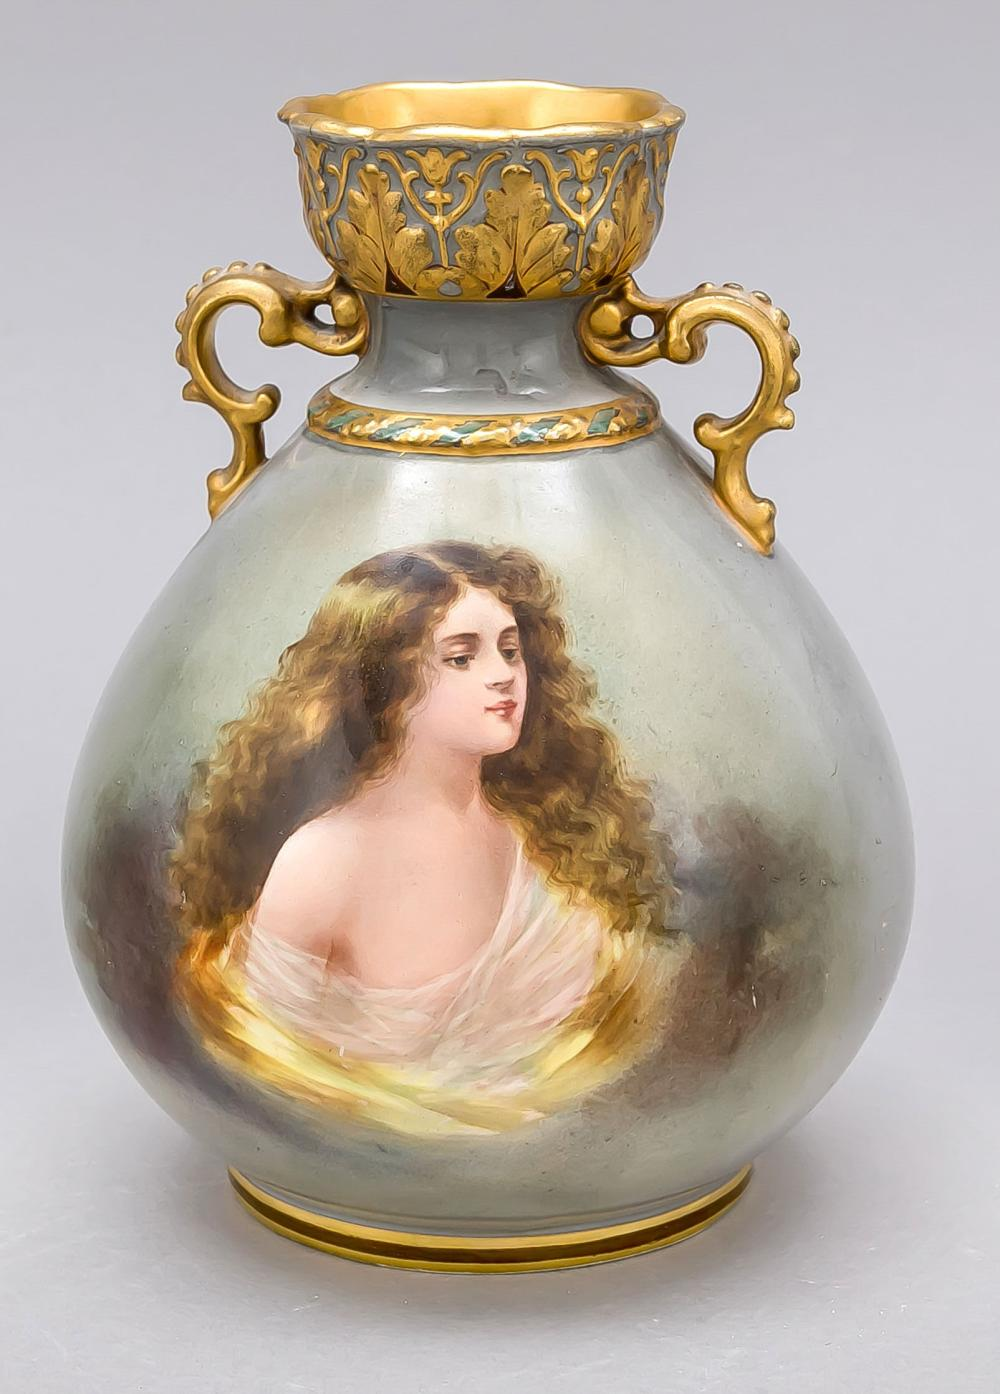 Art Nouveau vase, Mehlem, Bonn